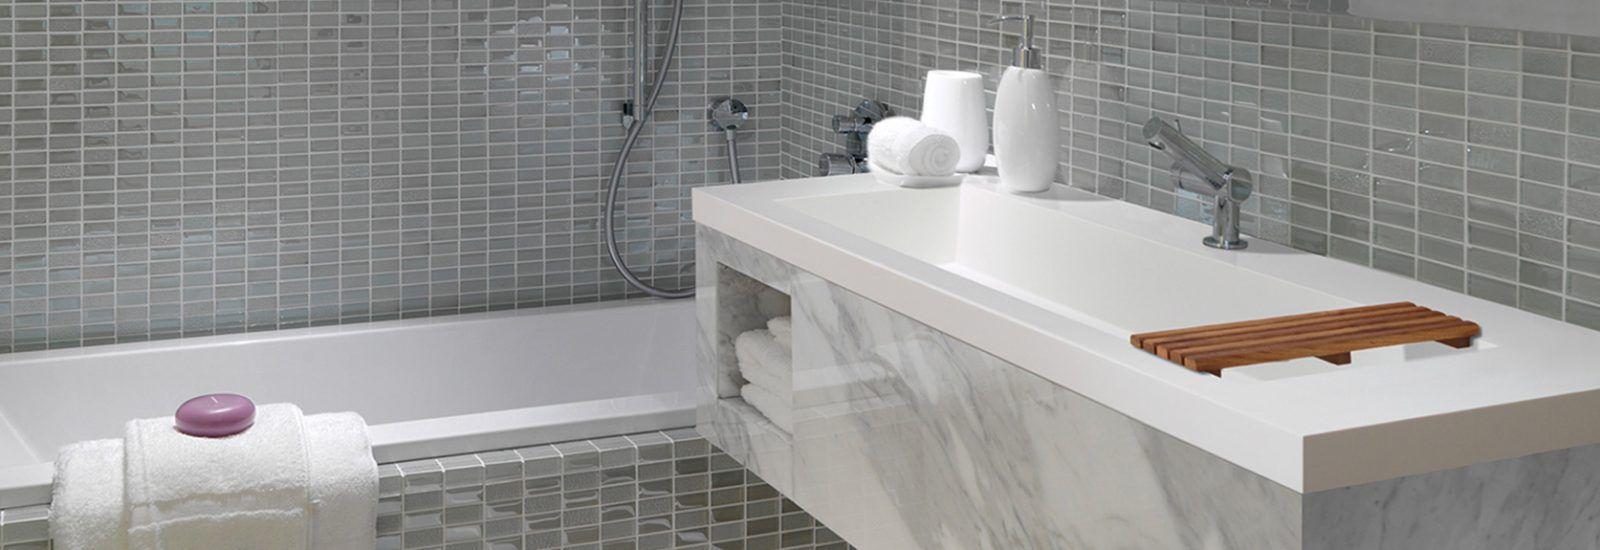 RM Living Cincinnati Interior Design Contemporary Bathrooms By MTI MTI6